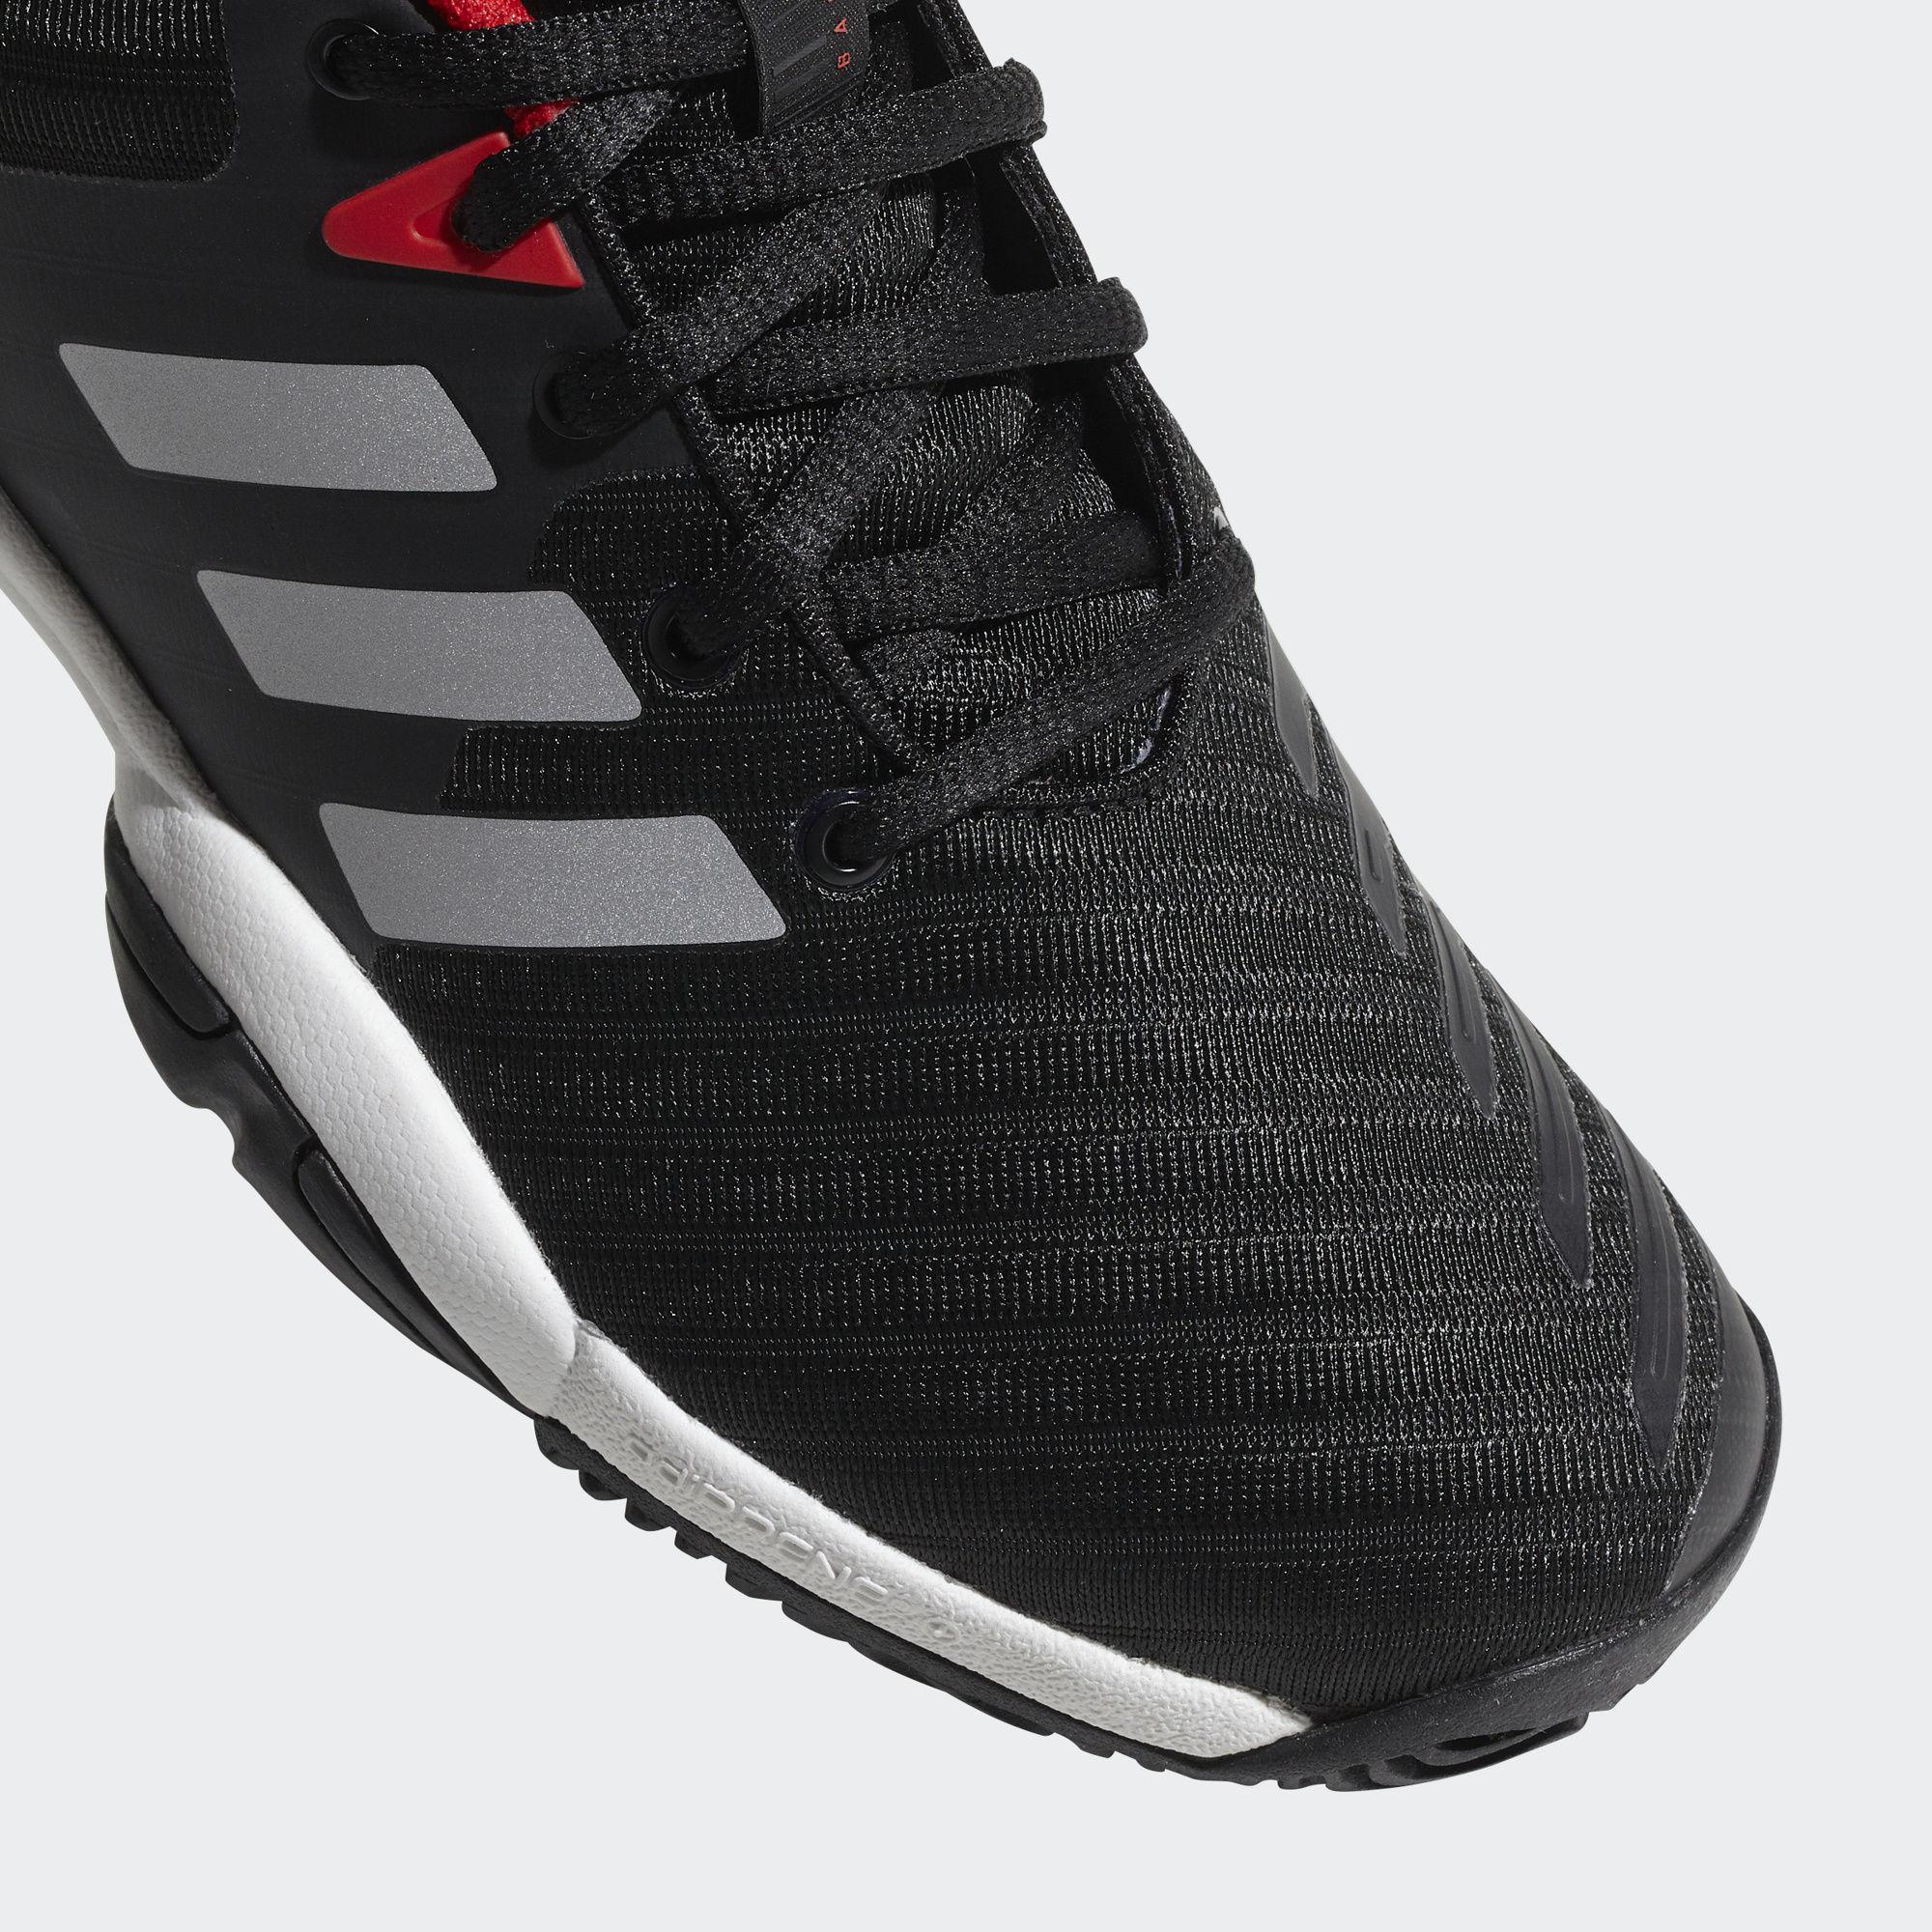 Adidas Barricade 2018 XJ Junior Tennis Shoes Just Rackets